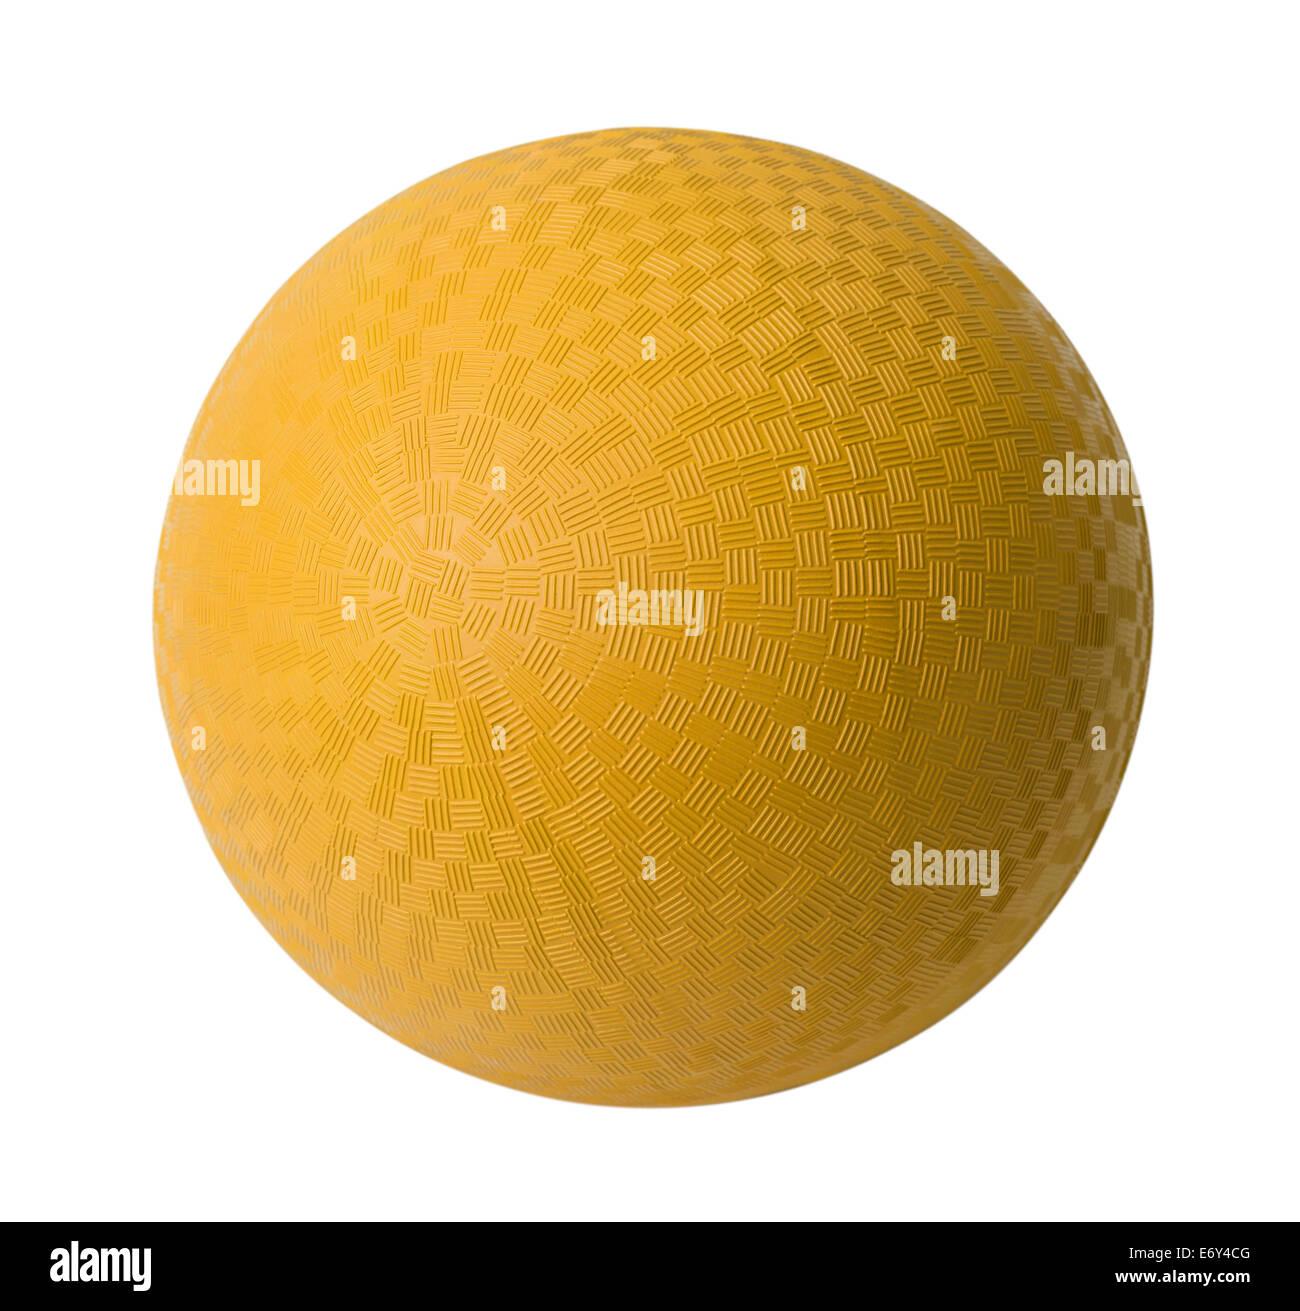 Gelbe Gummiball, Isolated on White Background. Stockbild